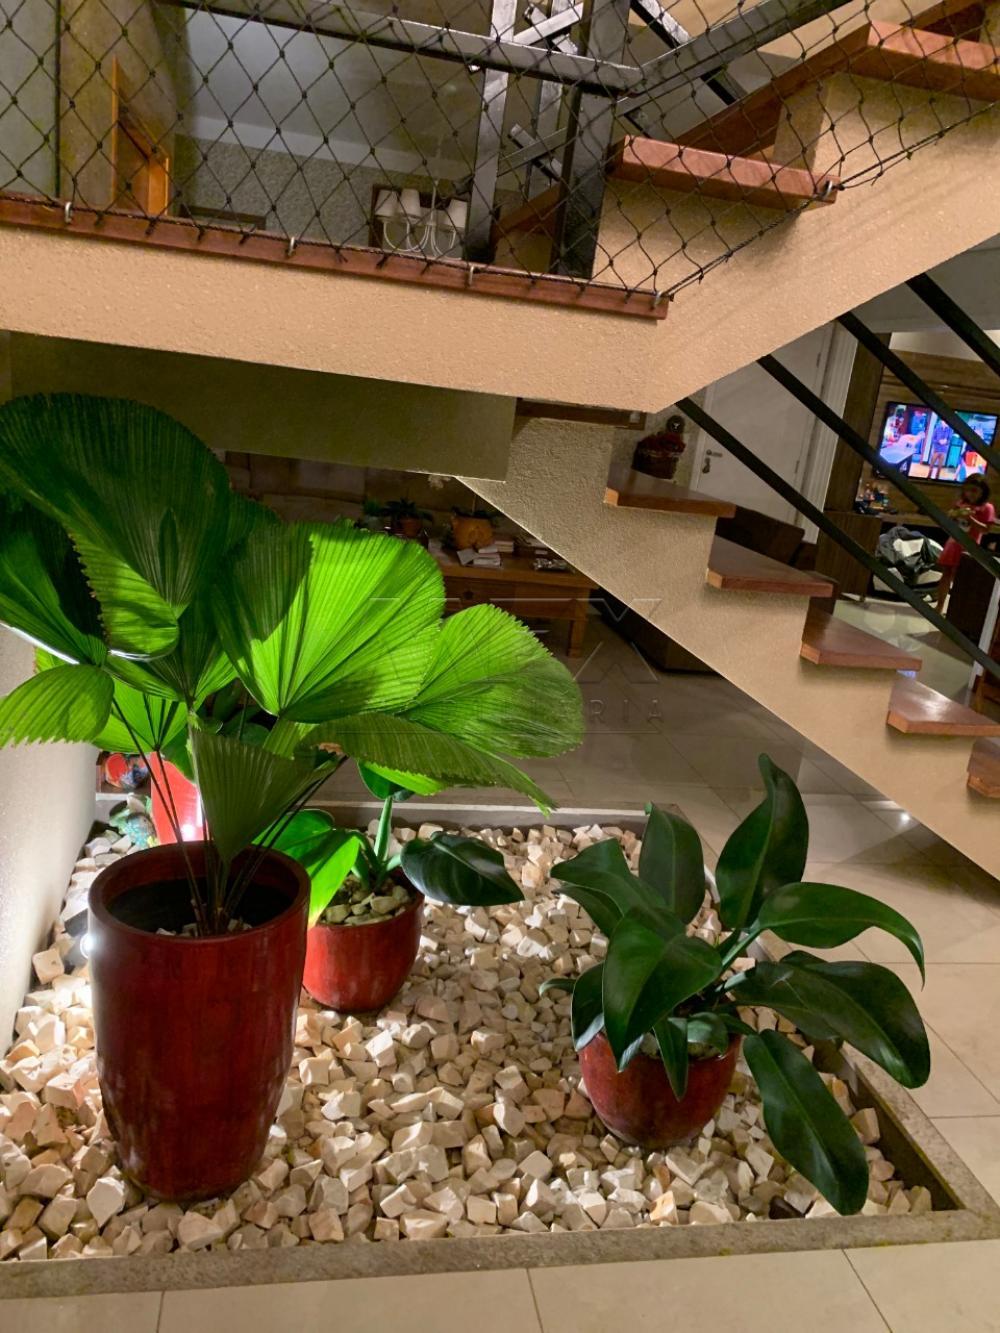 Comprar Casa / Condomínio em Bauru apenas R$ 1.500.000,00 - Foto 6